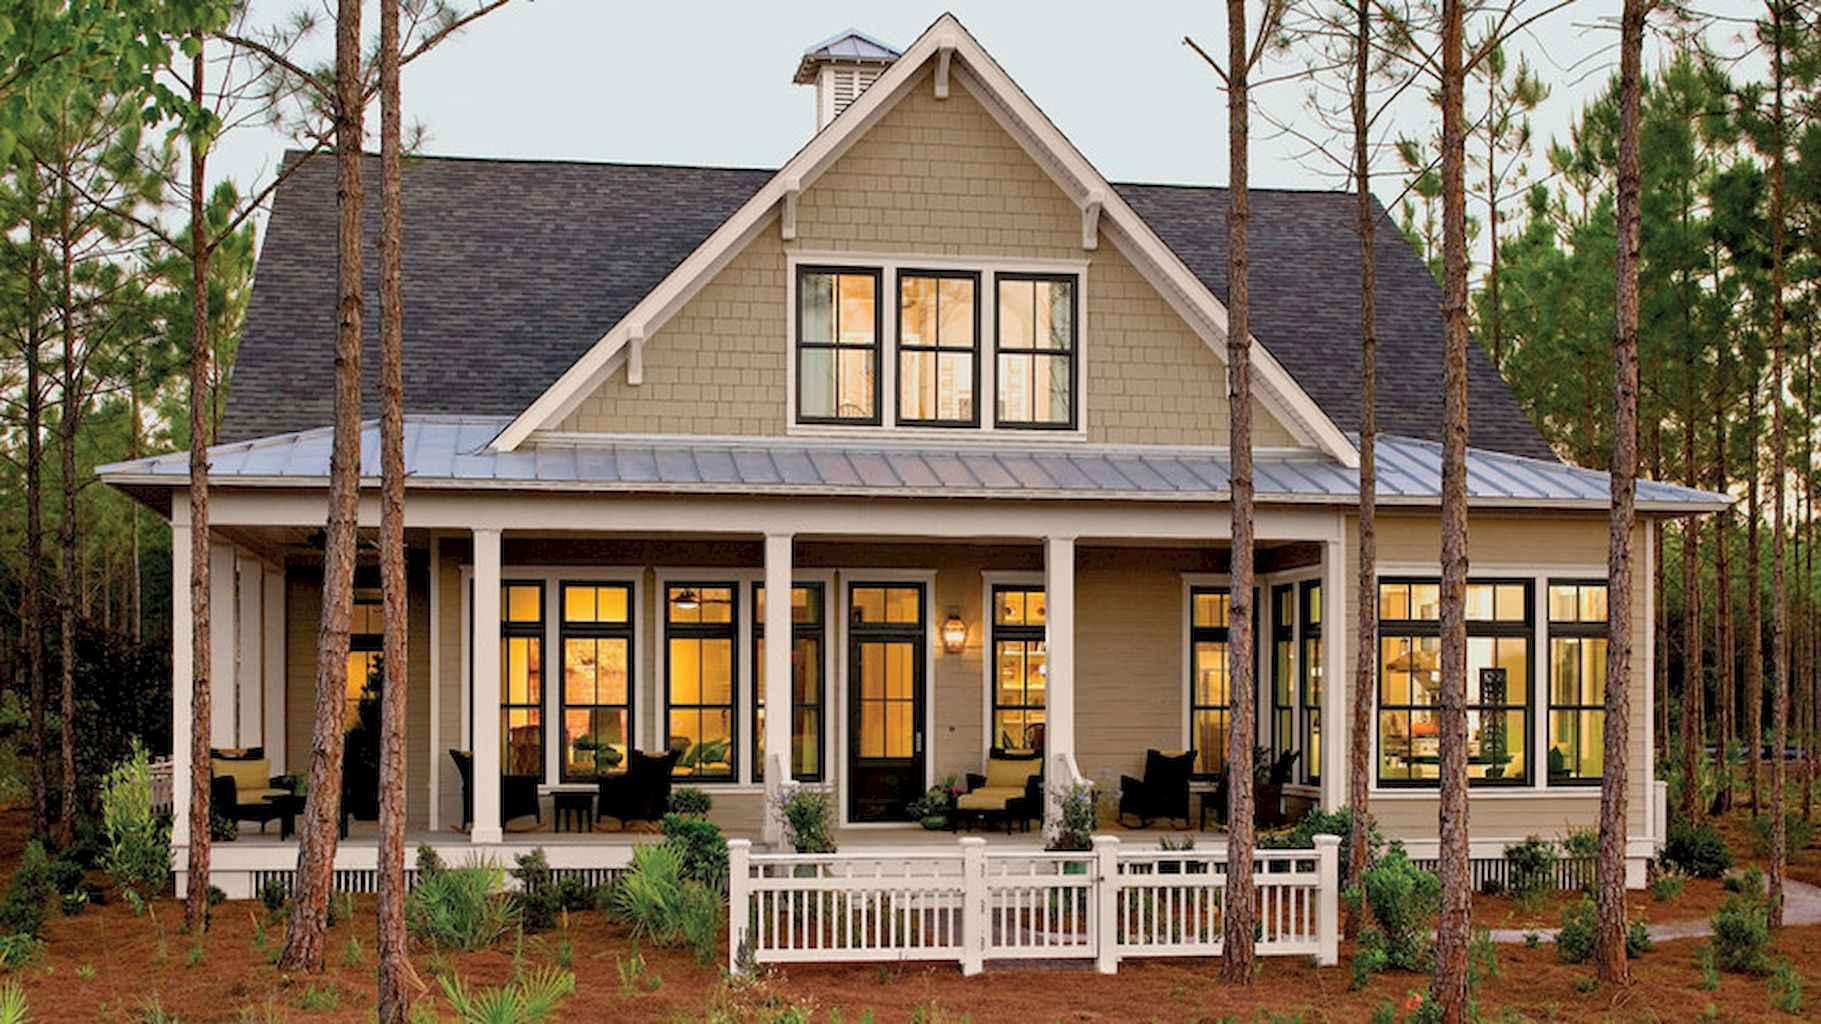 60 amazing farmhouse plans cracker style design ideas (45)